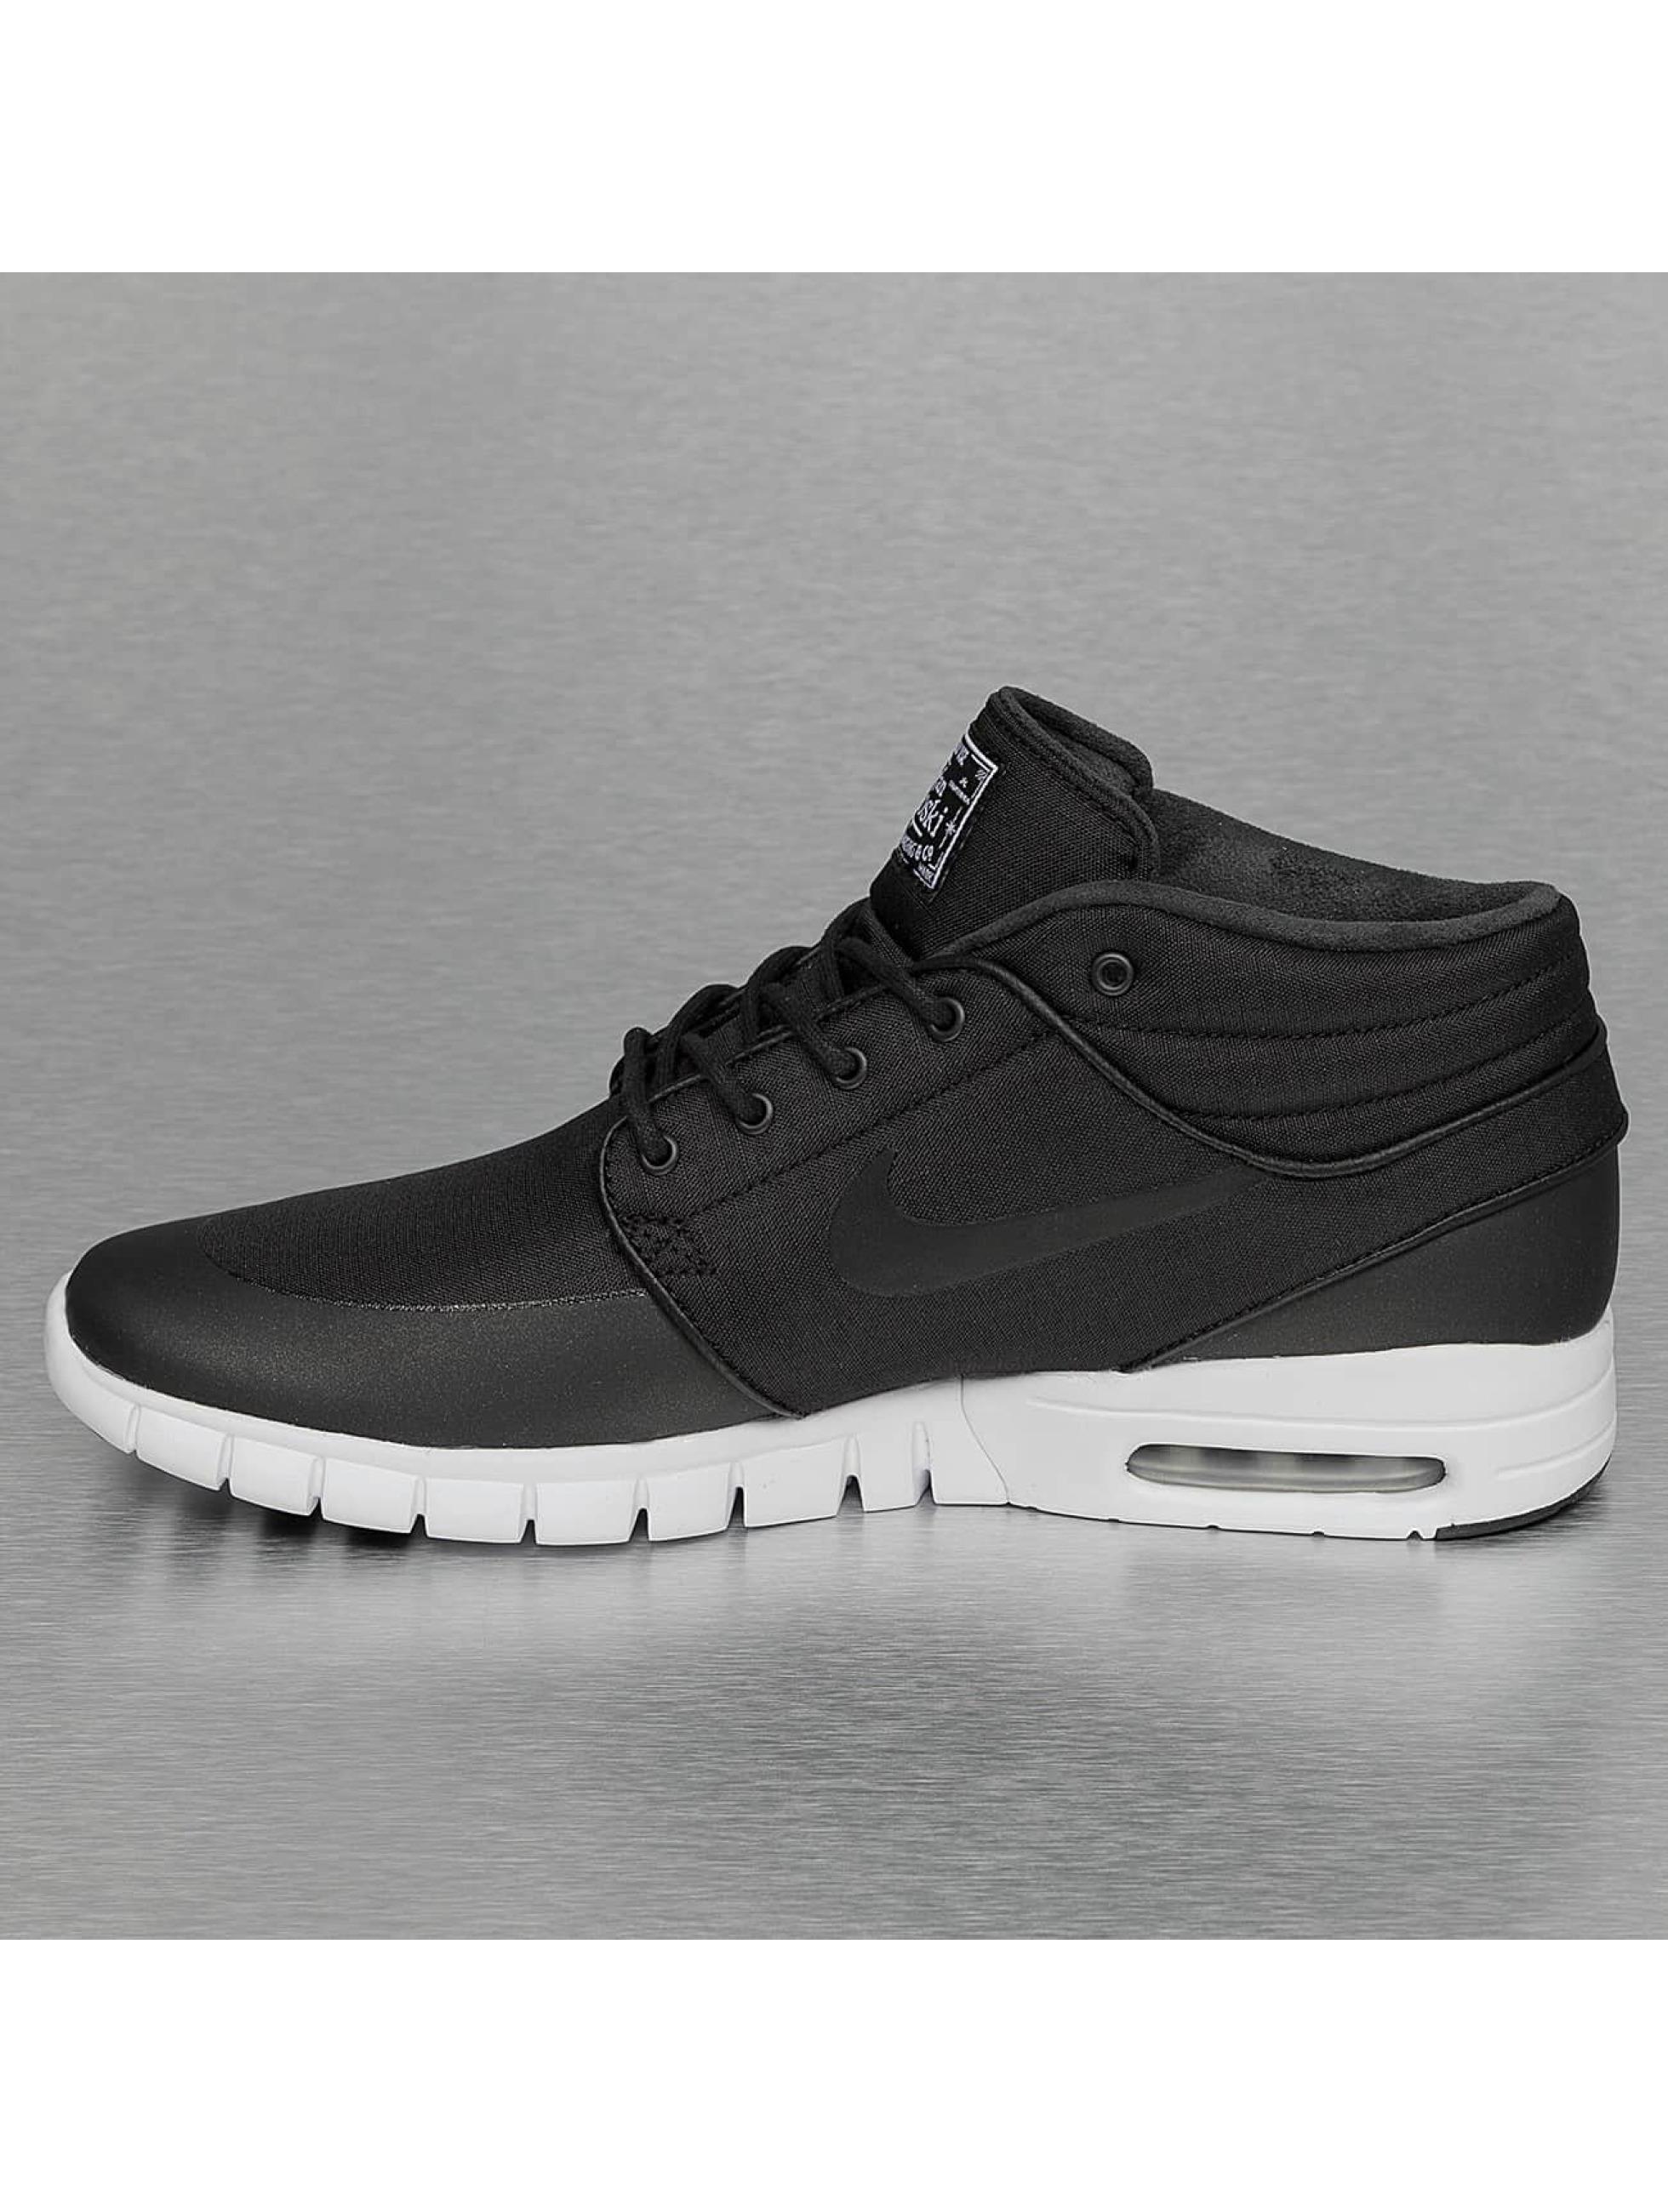 nike sb herren sneaker stefan janoski max mid in schwarz. Black Bedroom Furniture Sets. Home Design Ideas